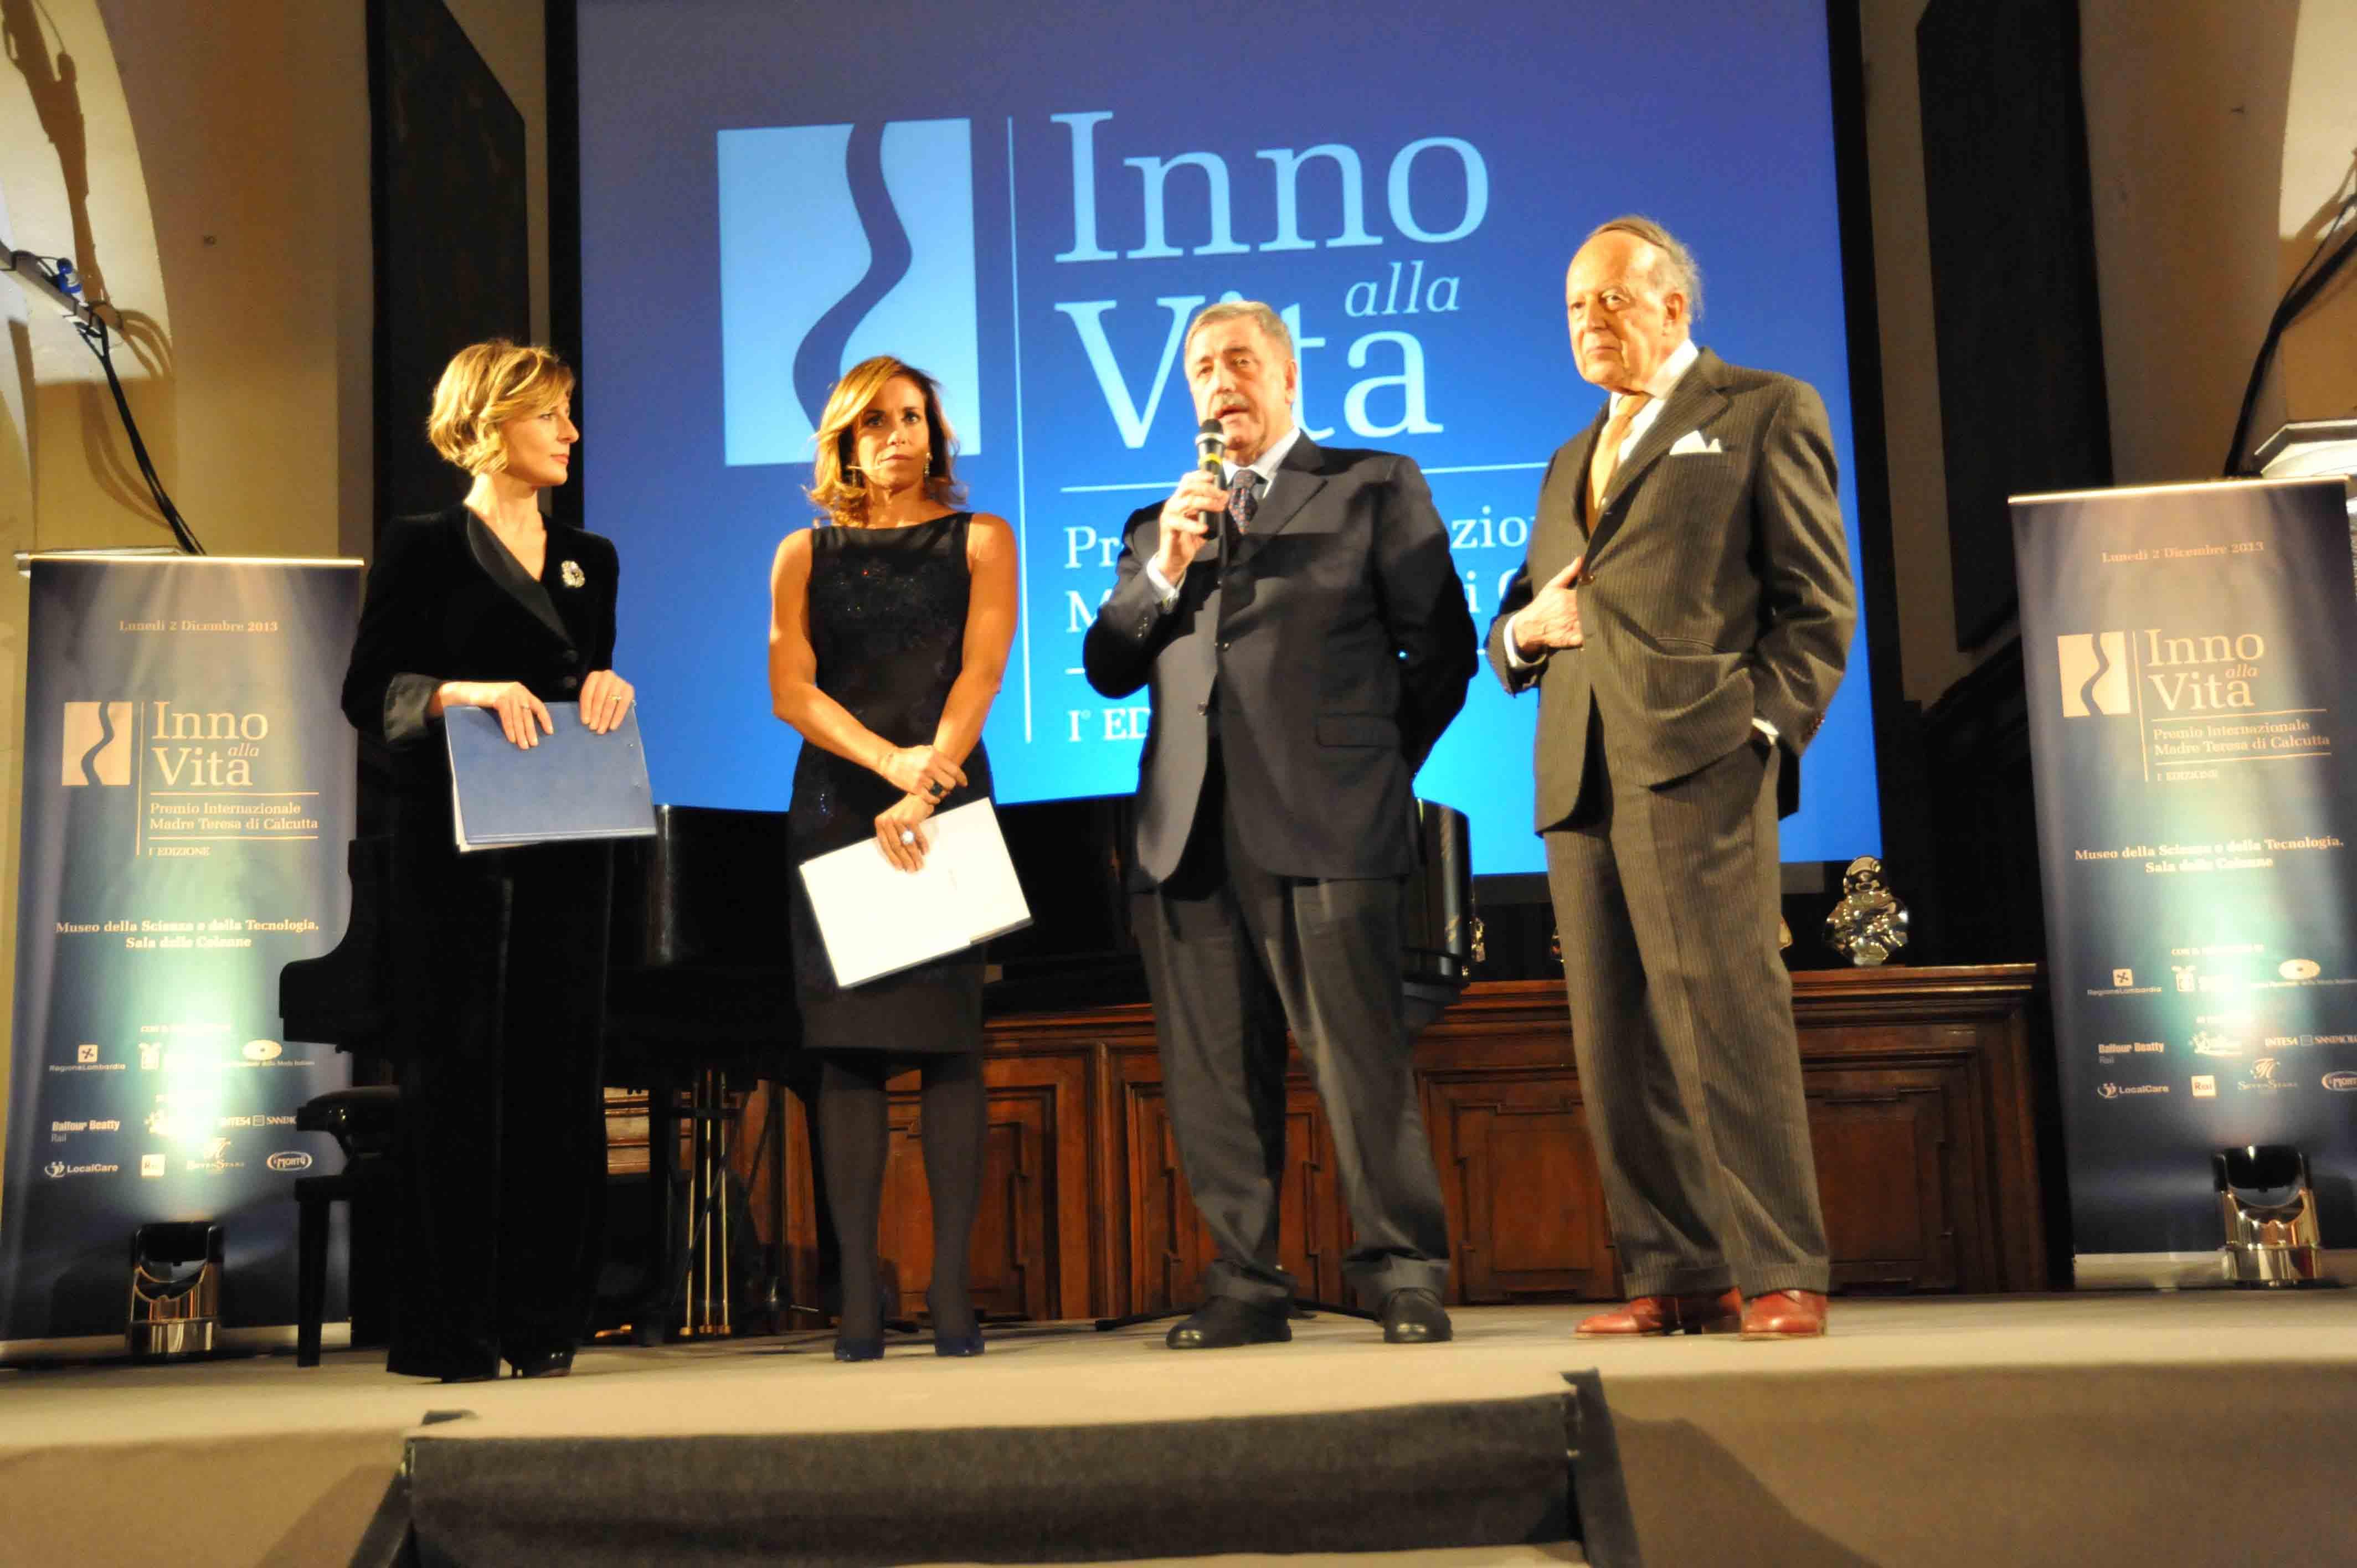 Premio_Inno_alla_Vita_2-12-_13_-_Nausika_Spahia__Cristina_Prodi__Guido_Podest___Renato_Ugo